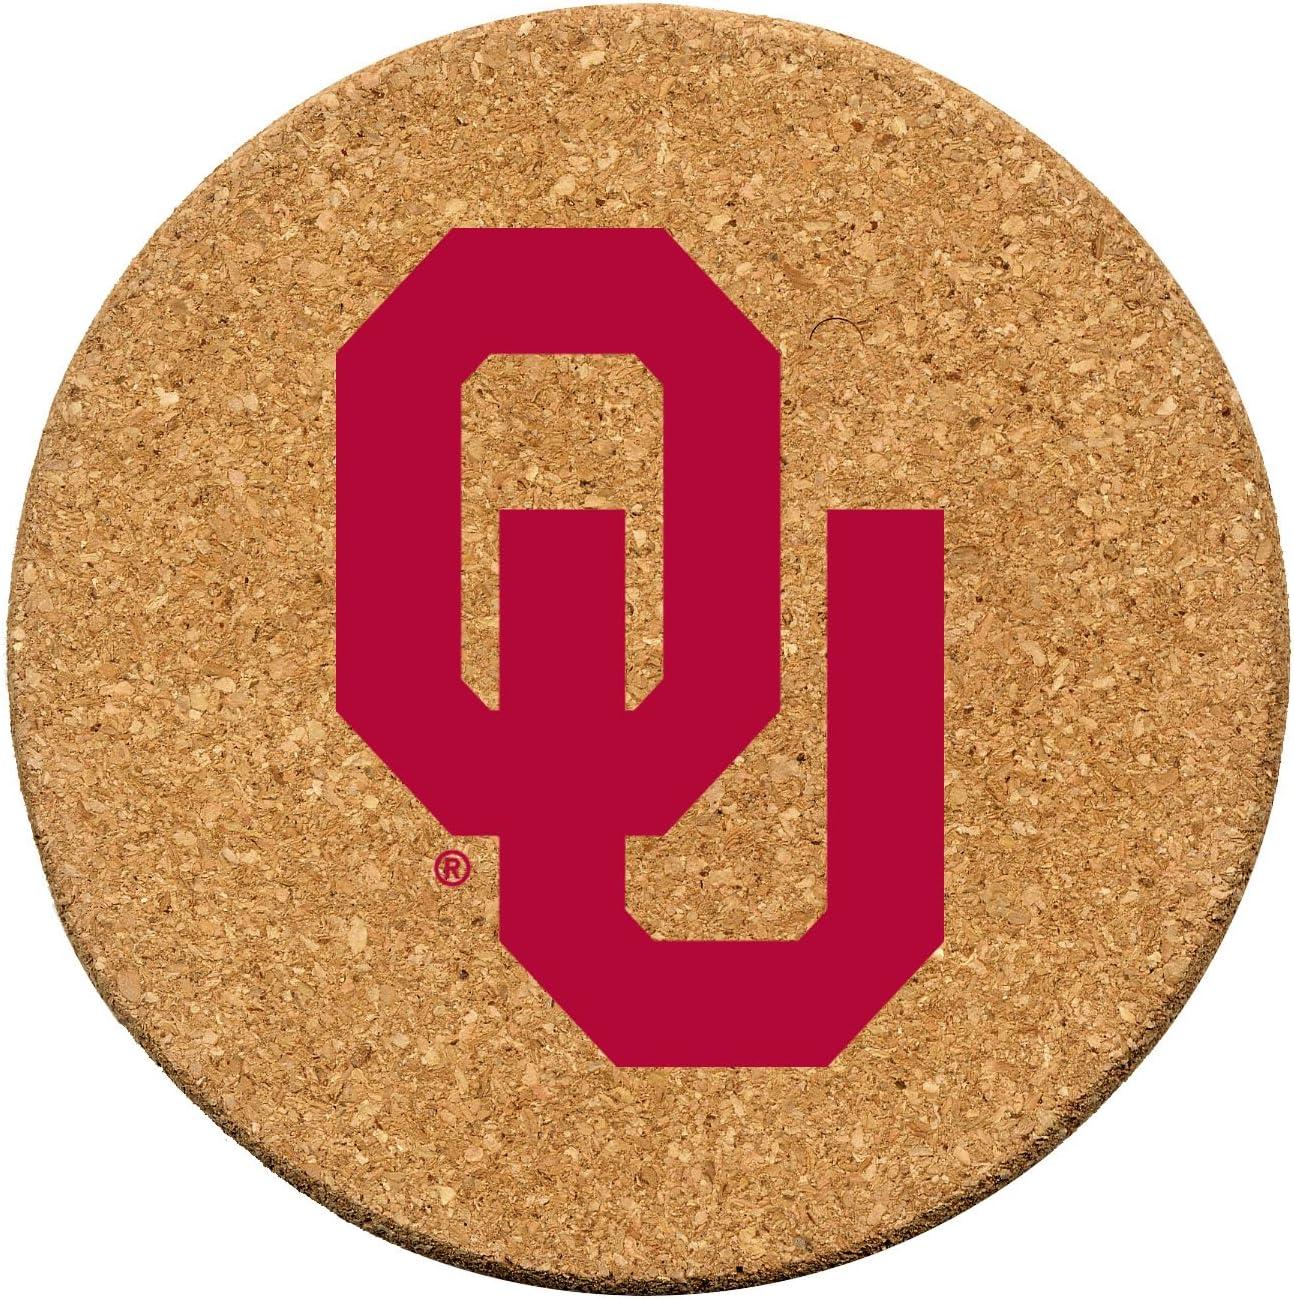 Thirstystone Topics on TV University of Oklahoma Cork Set Charlotte Mall Coaster